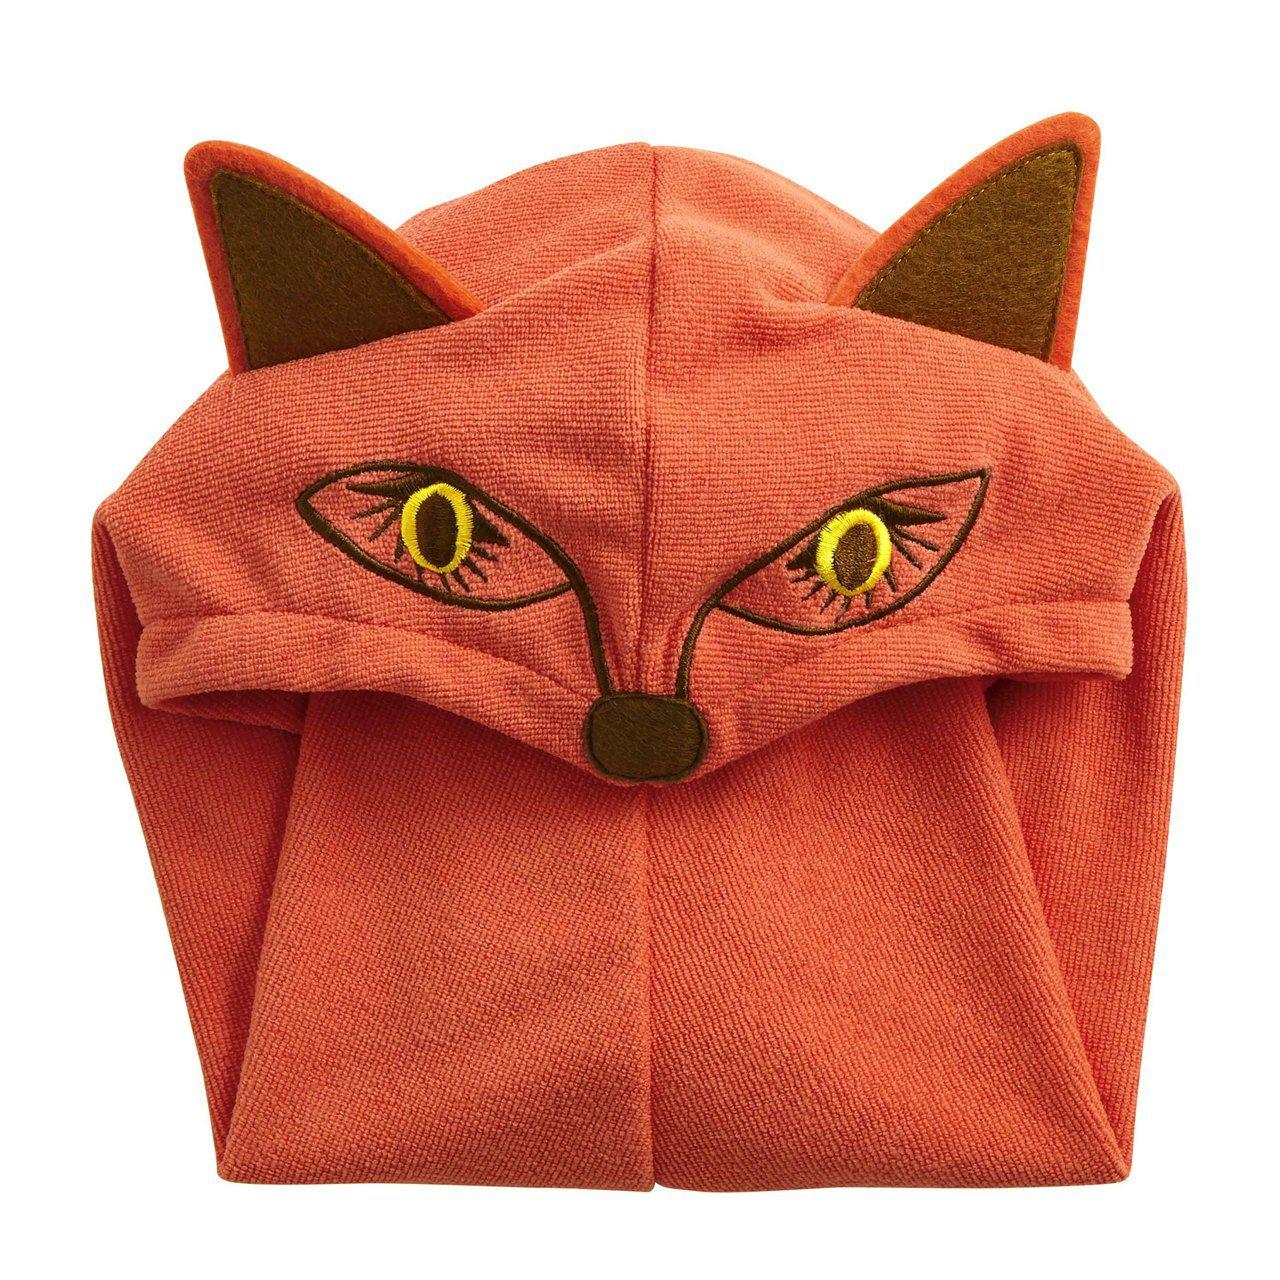 THE BODY SHOP動物快乾髮巾(狐狸),售價680元。圖/THE BOD...